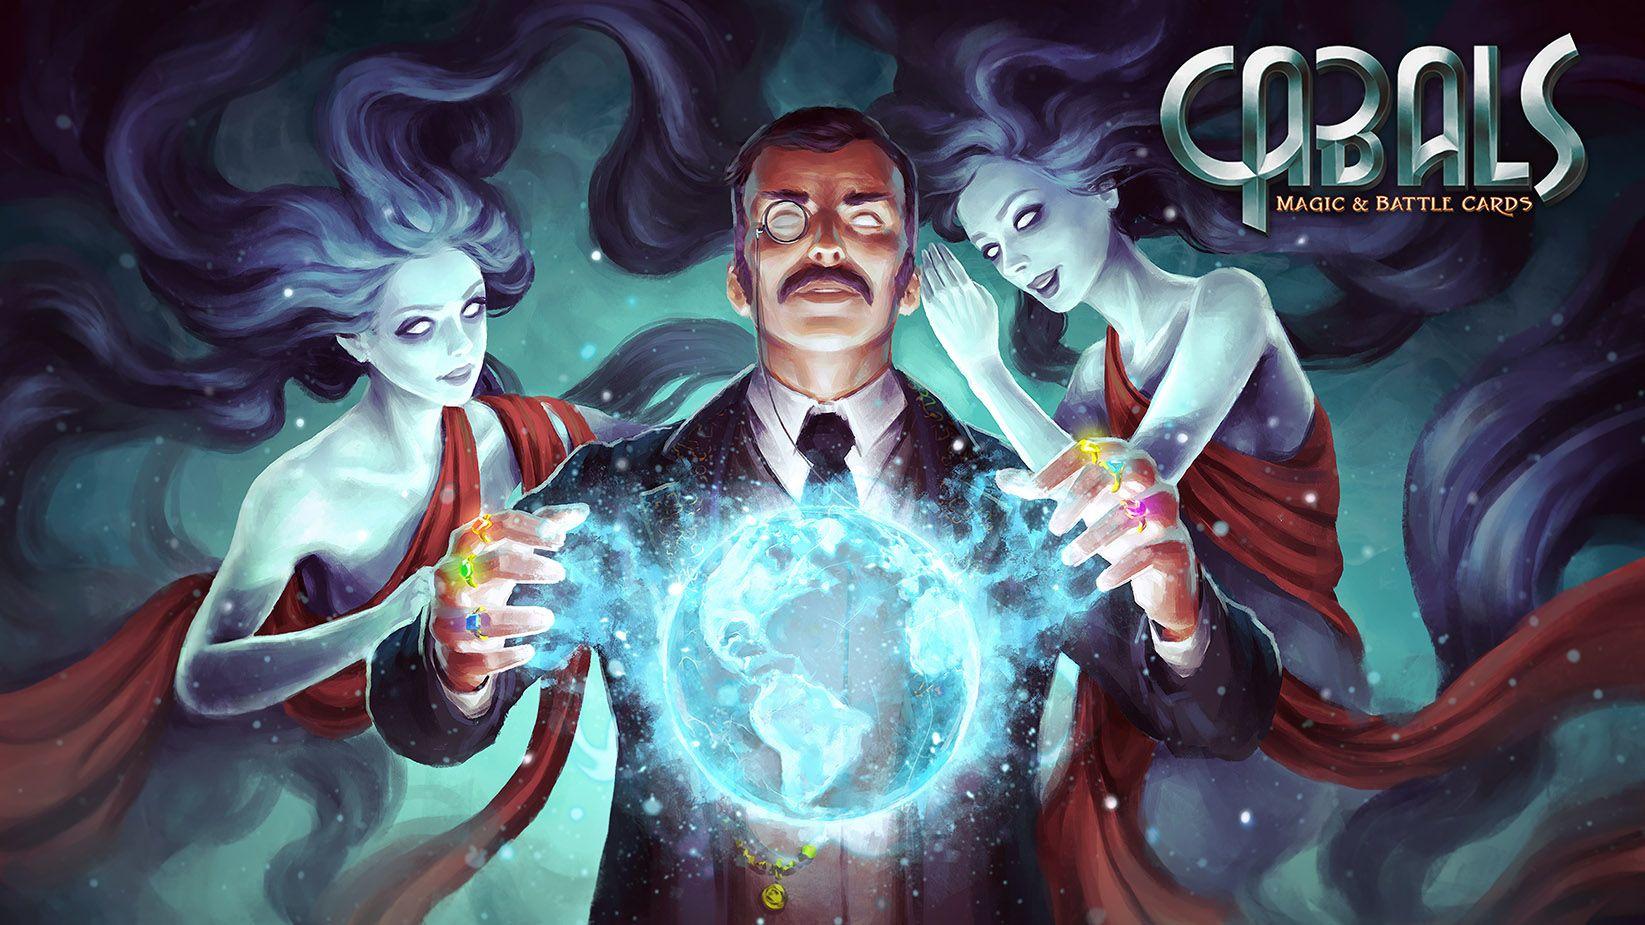 Cabals Magic & Battle Cards on Steam Battle card games